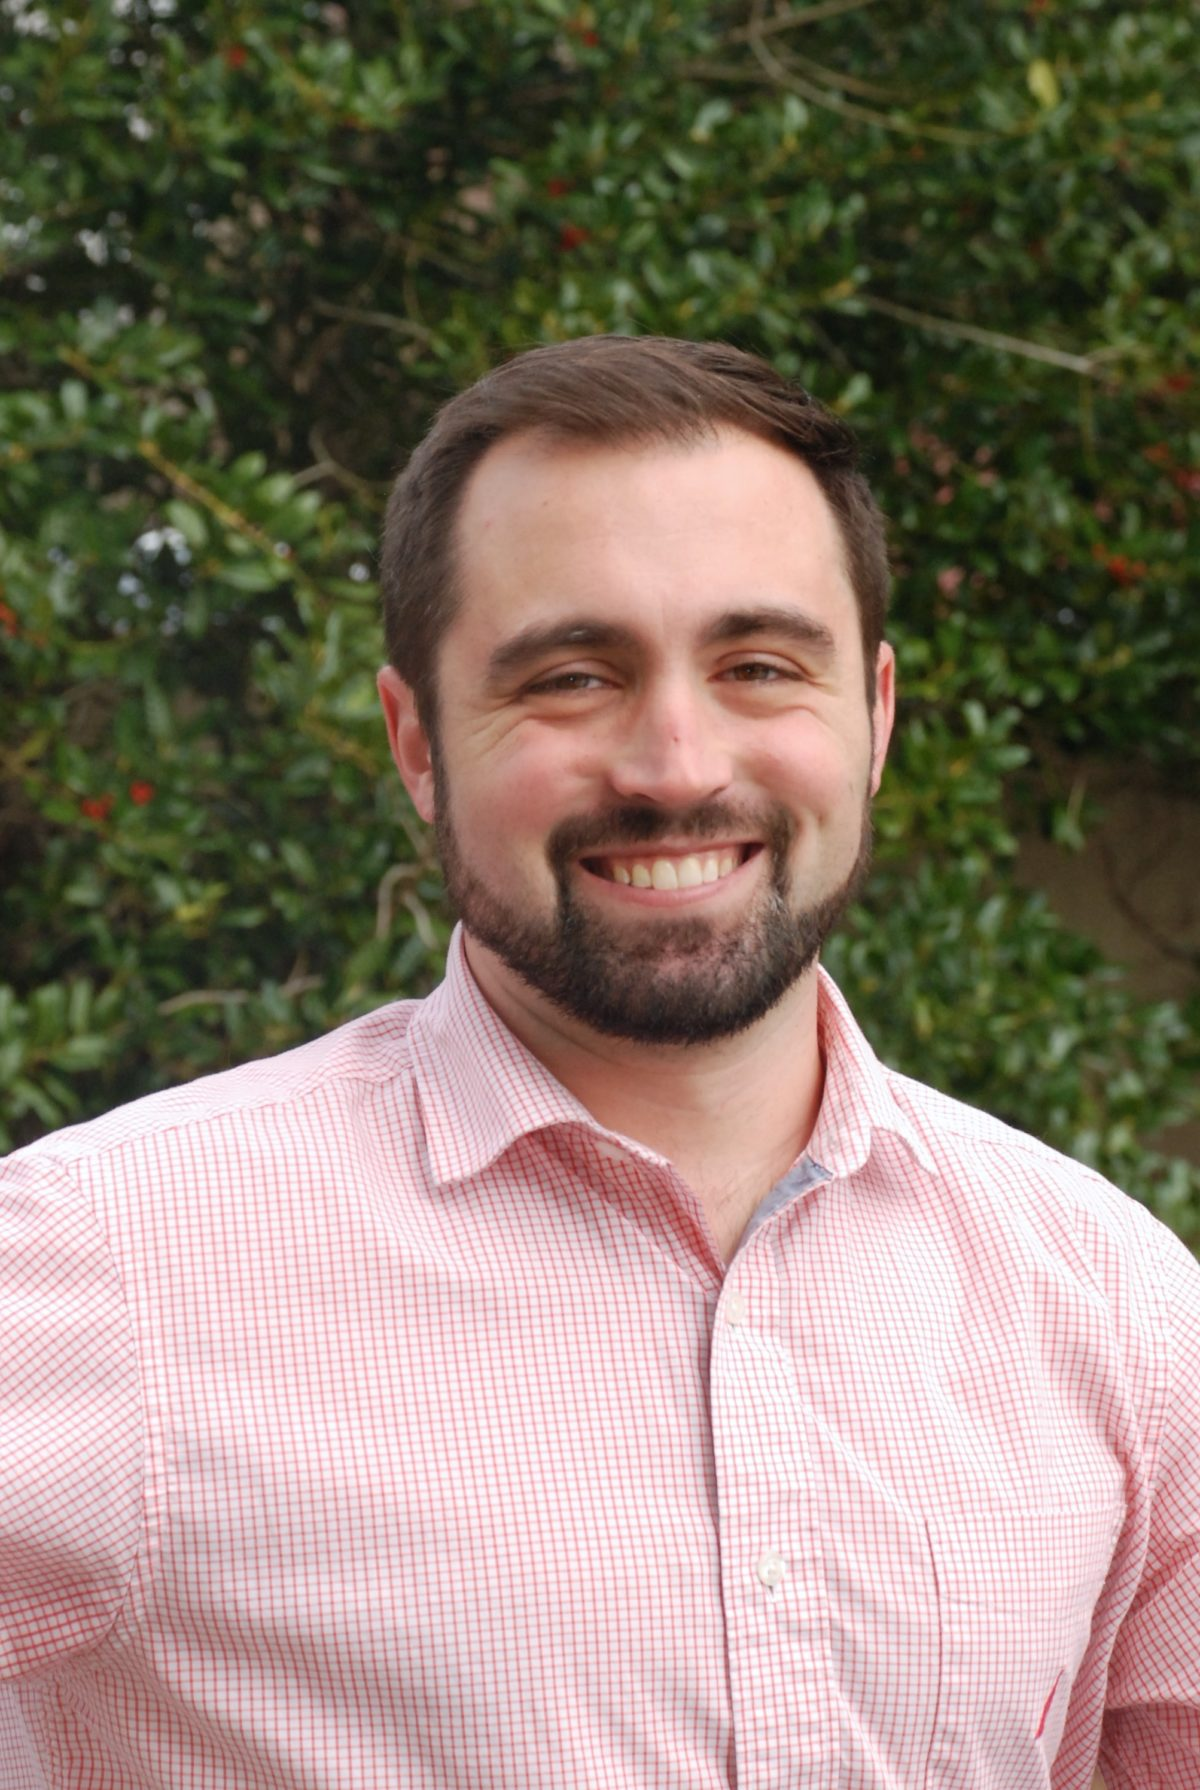 Ian Murray, M.Ed., LCMHC